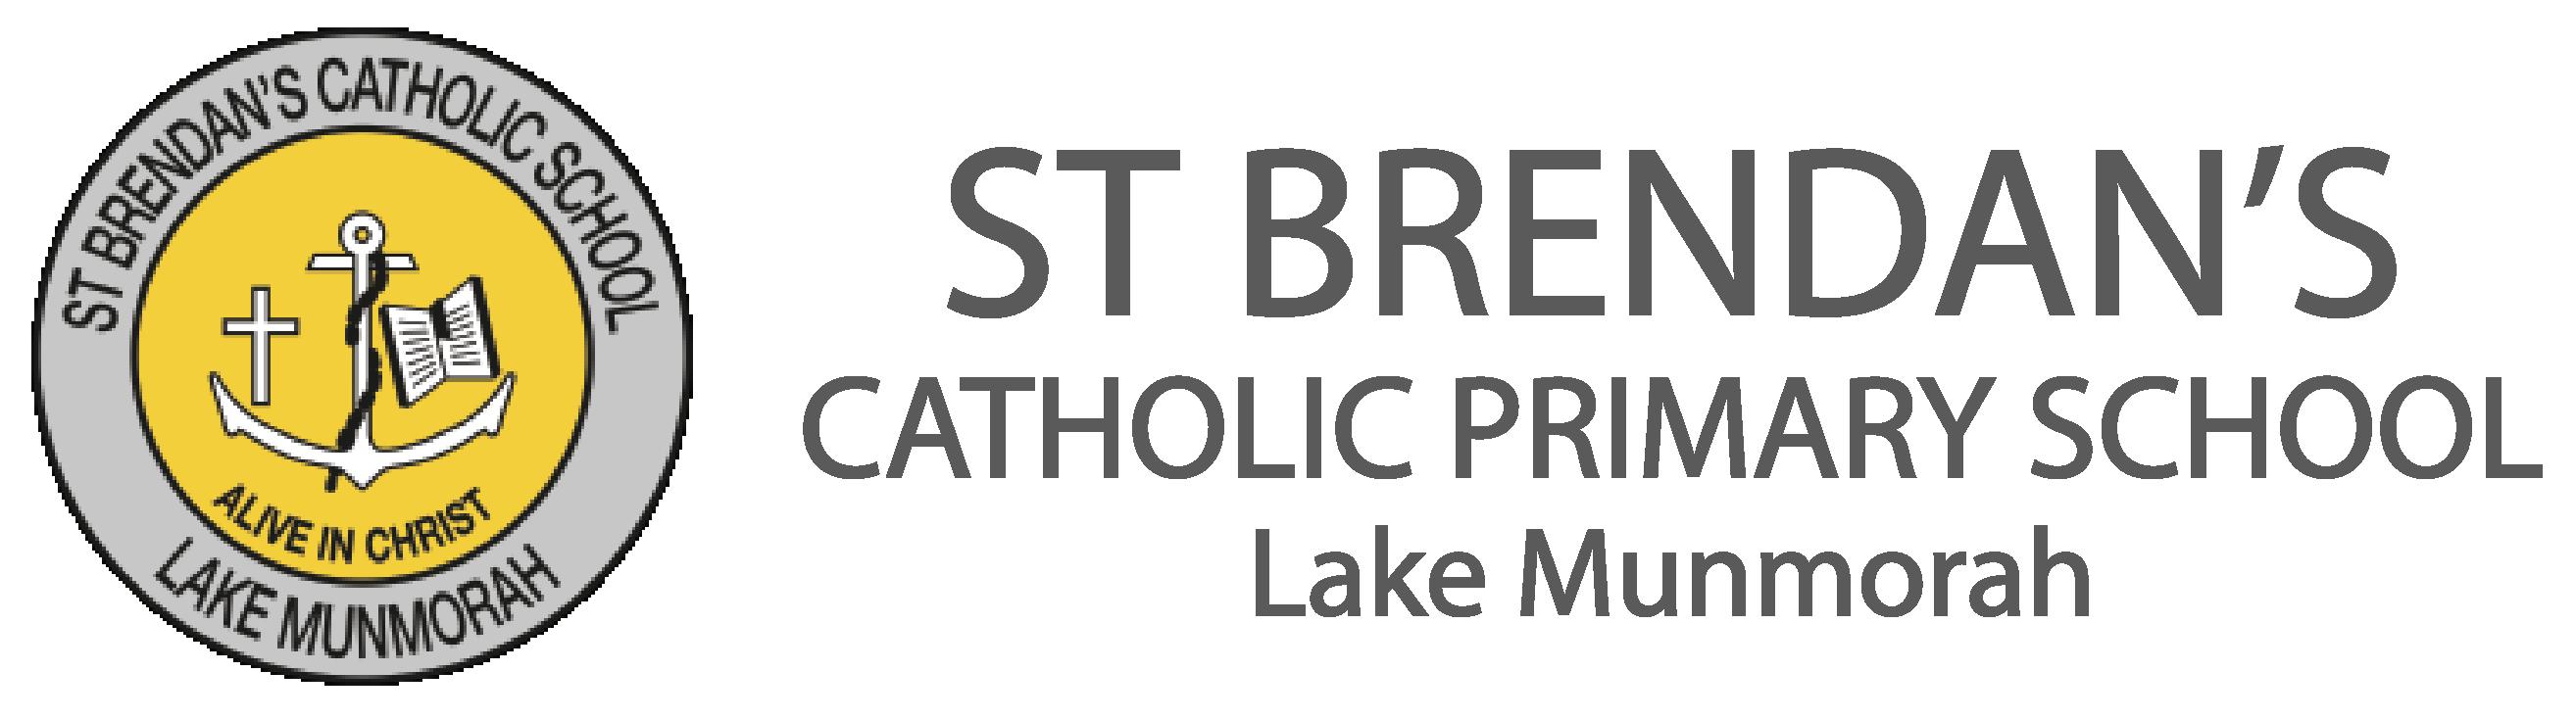 St Brendans Lake Munmorah